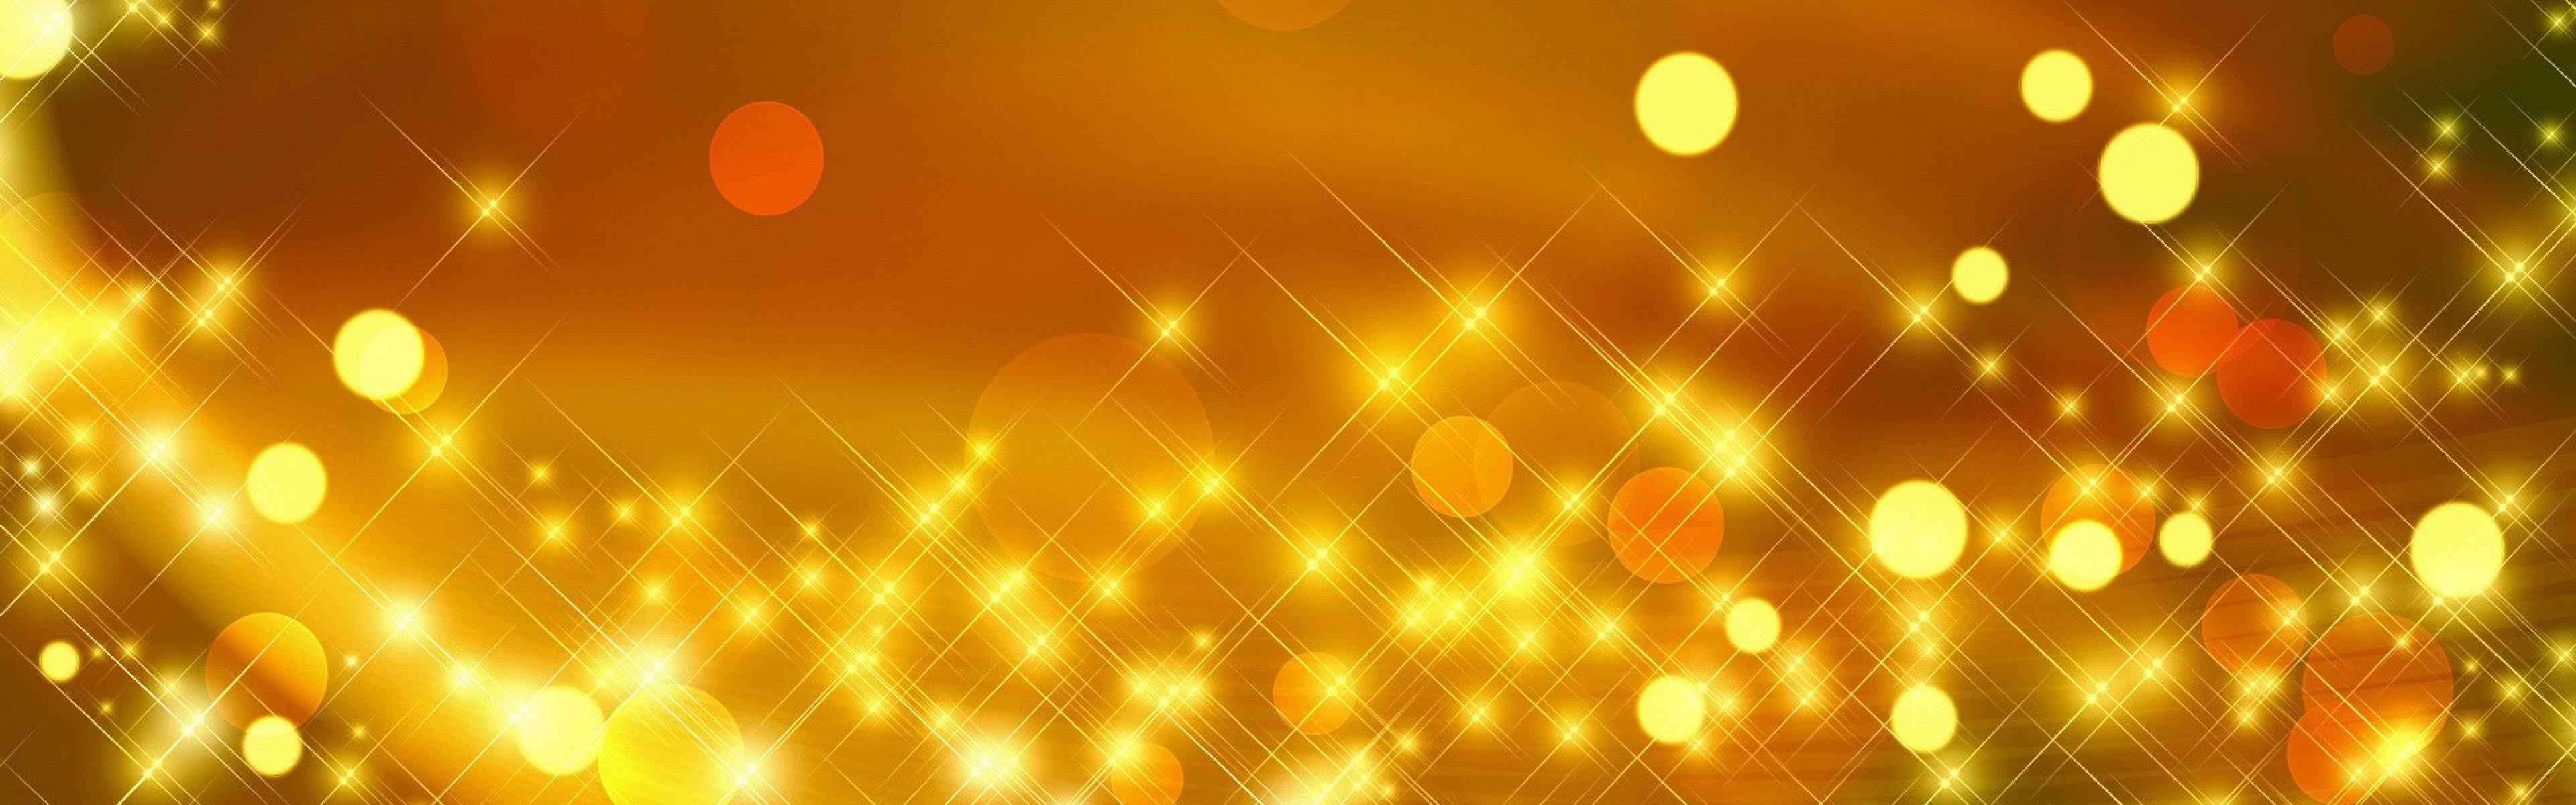 Preview wallpaper glare, gold, shiny, bright, circles 3840x1200